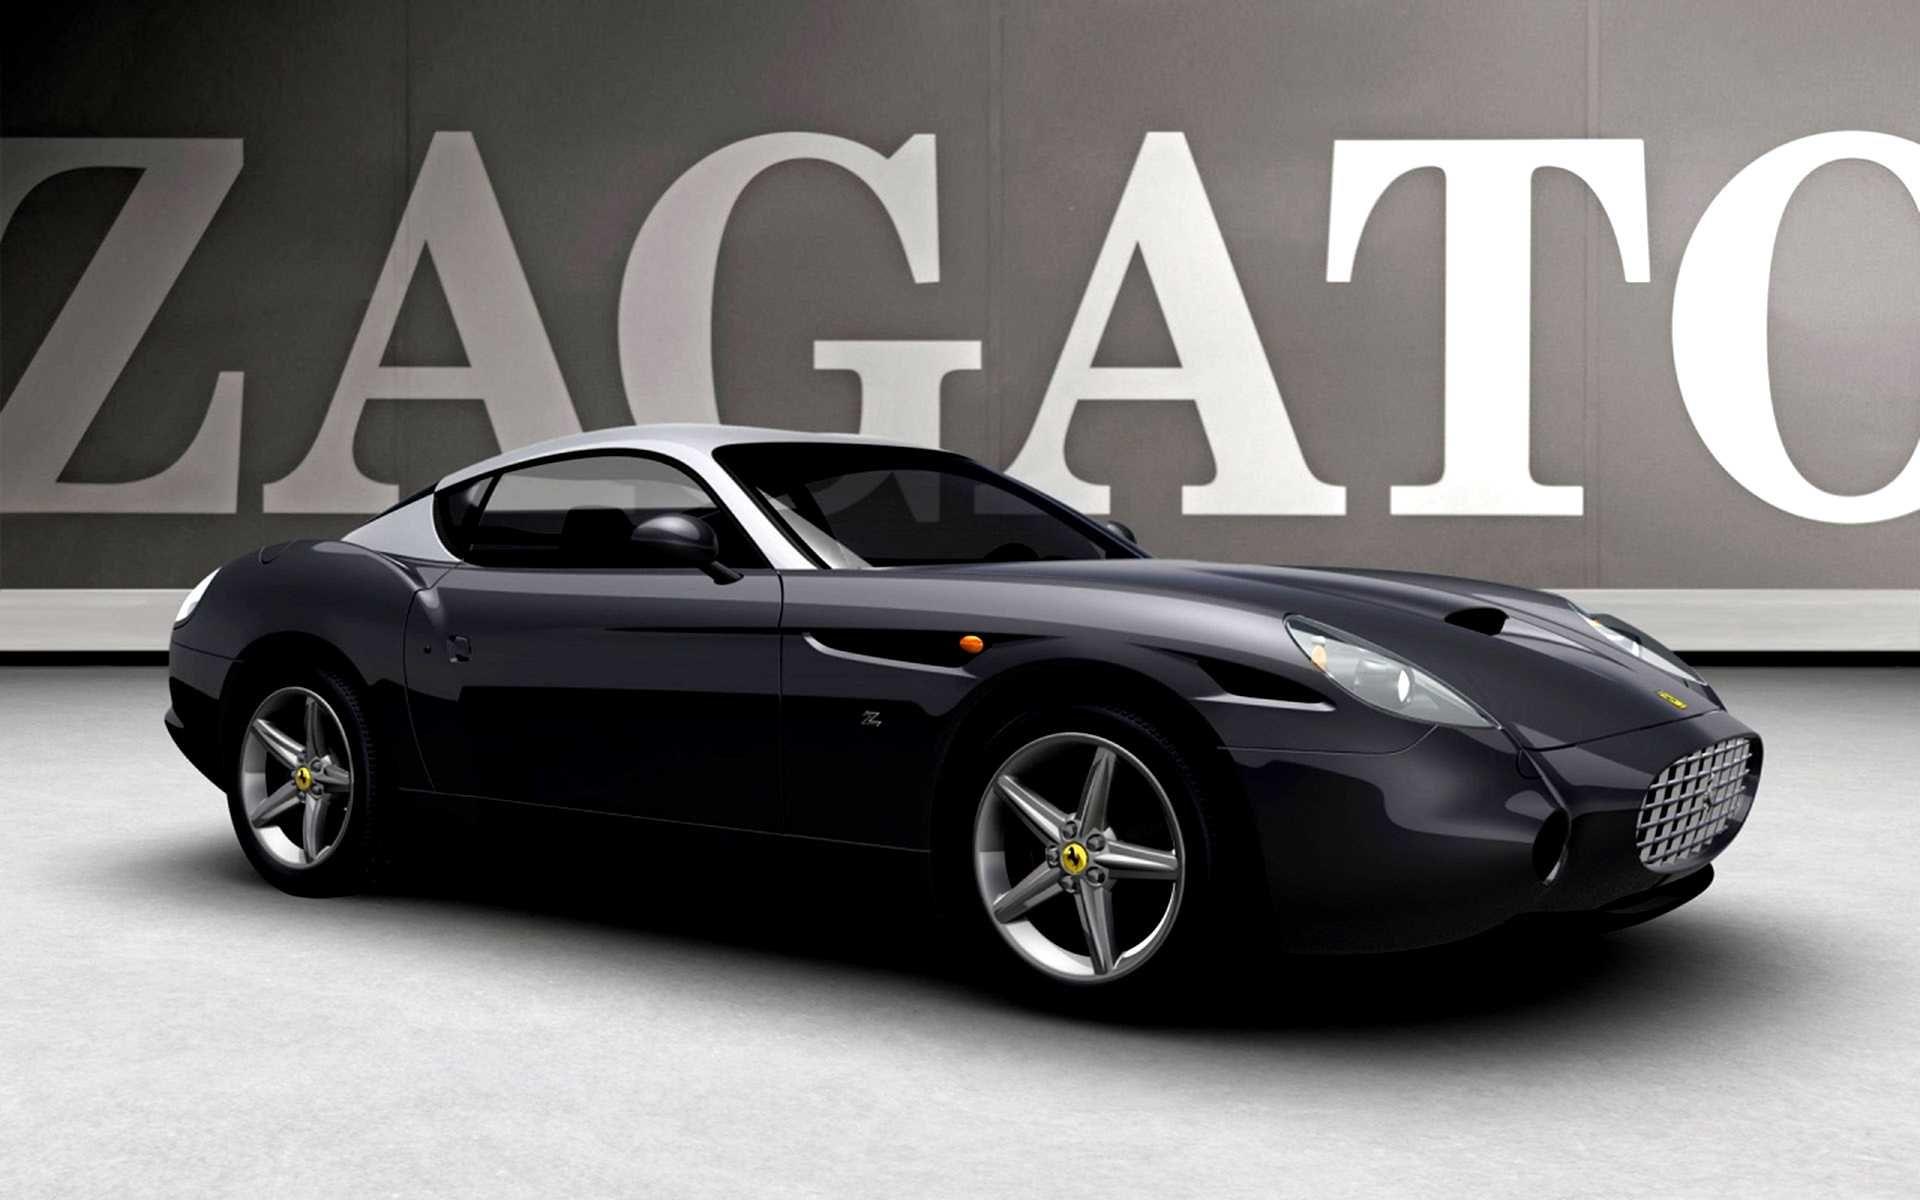 Ferrari Z Car Hd Wallpaper